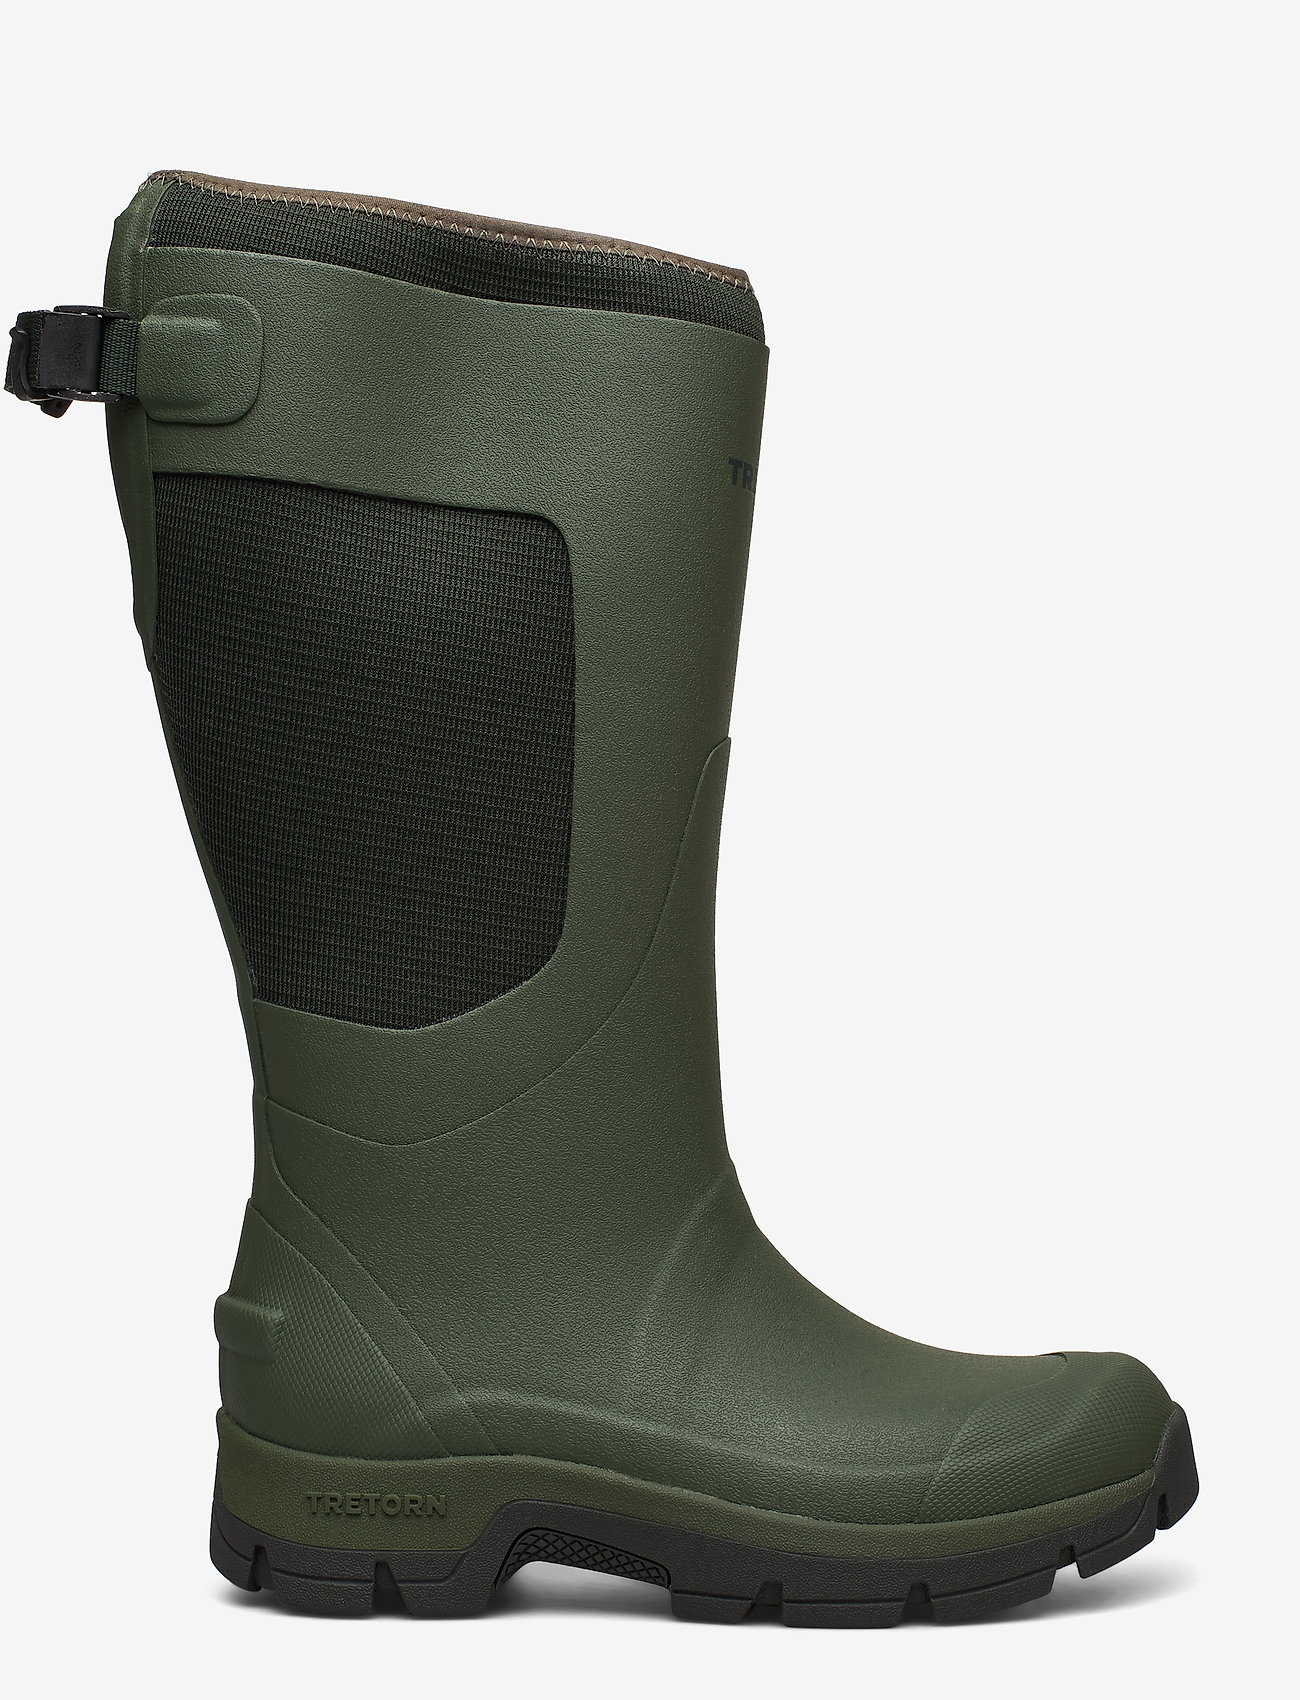 Tretorn - TORNEVIK NEO - kängor - green - 1